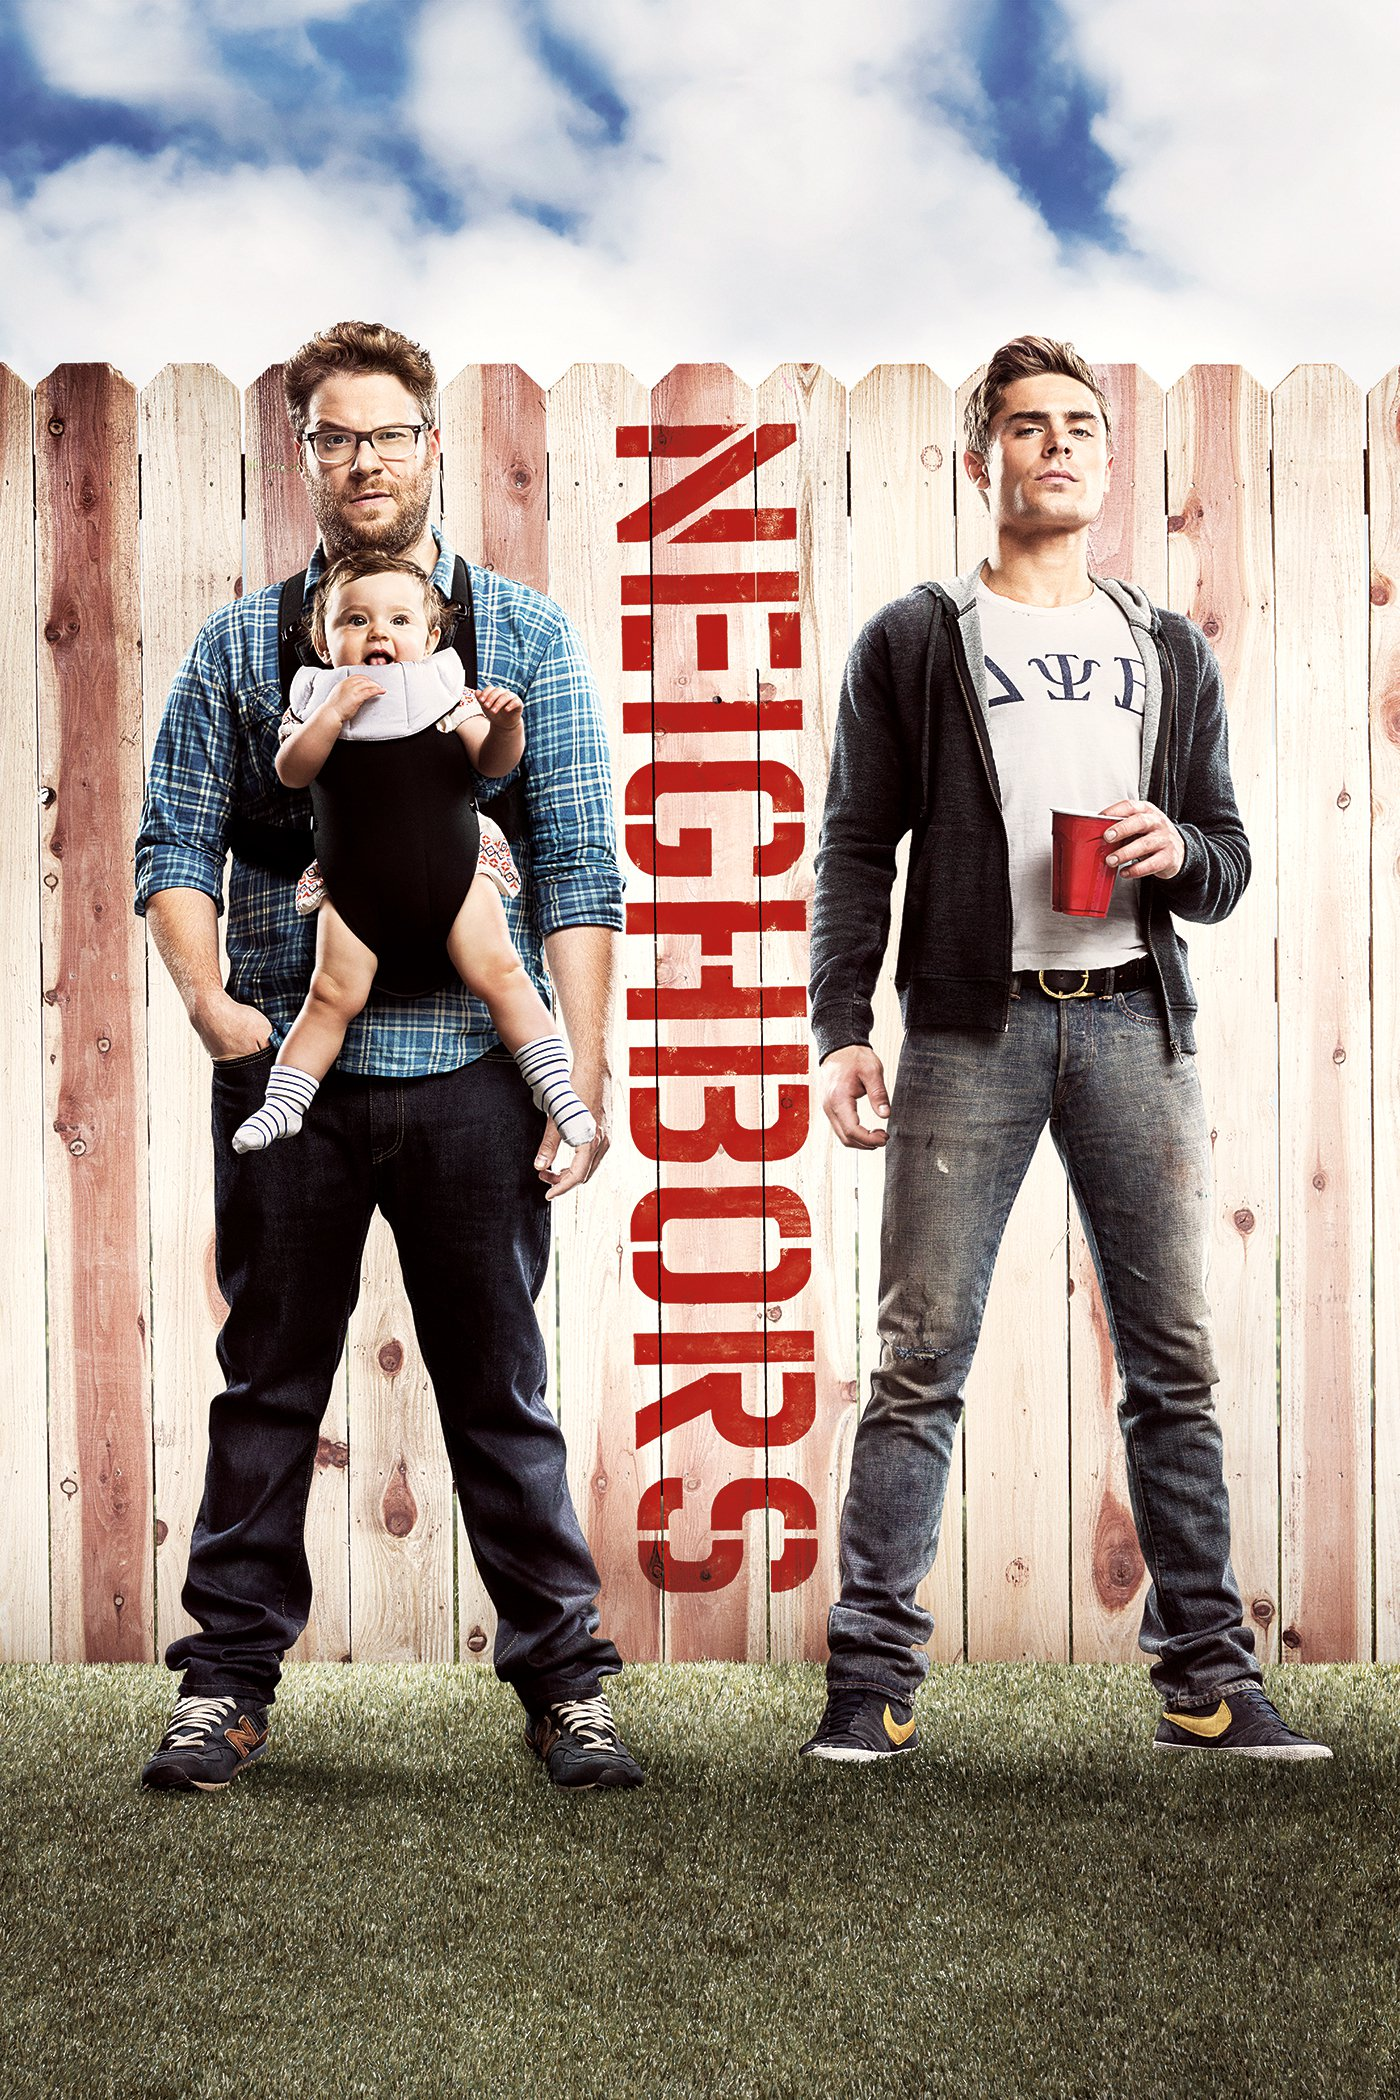 Neighbors, 2014